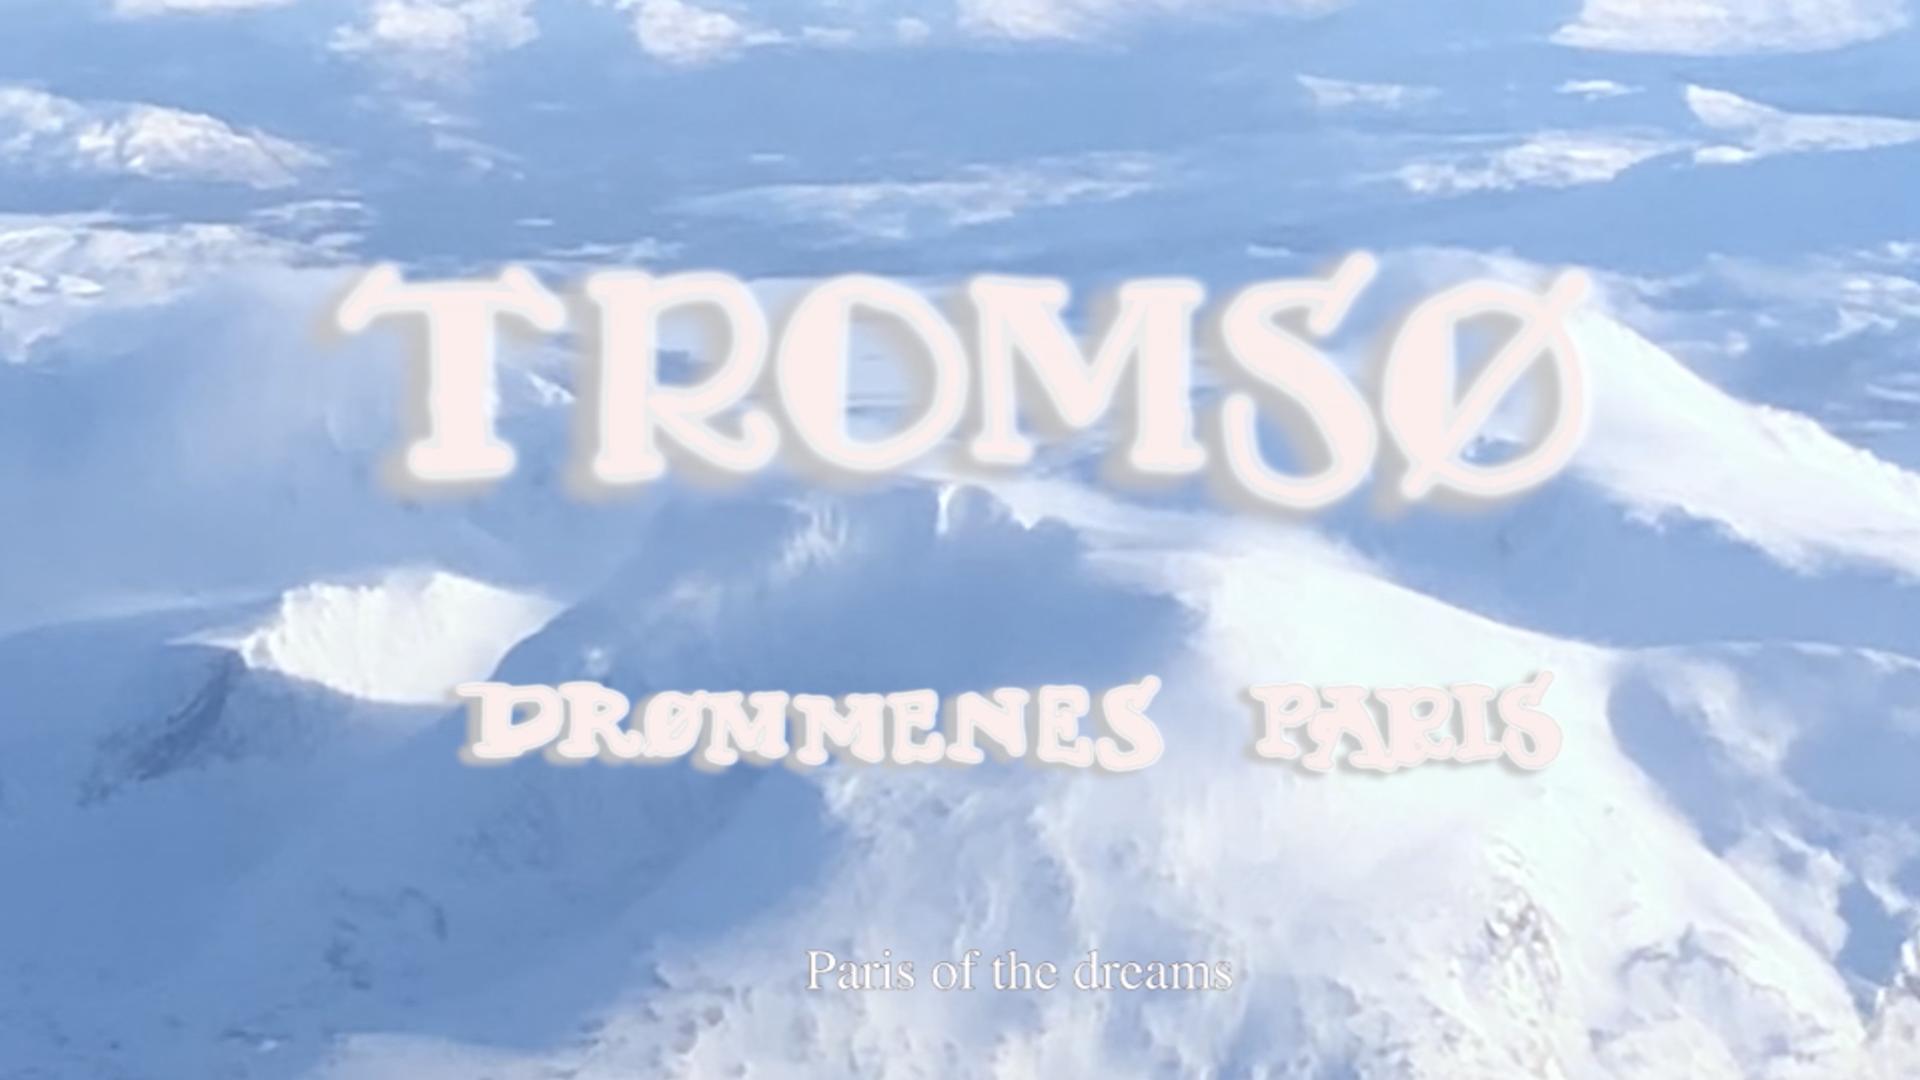 Tromsø - Drømmenes Paris